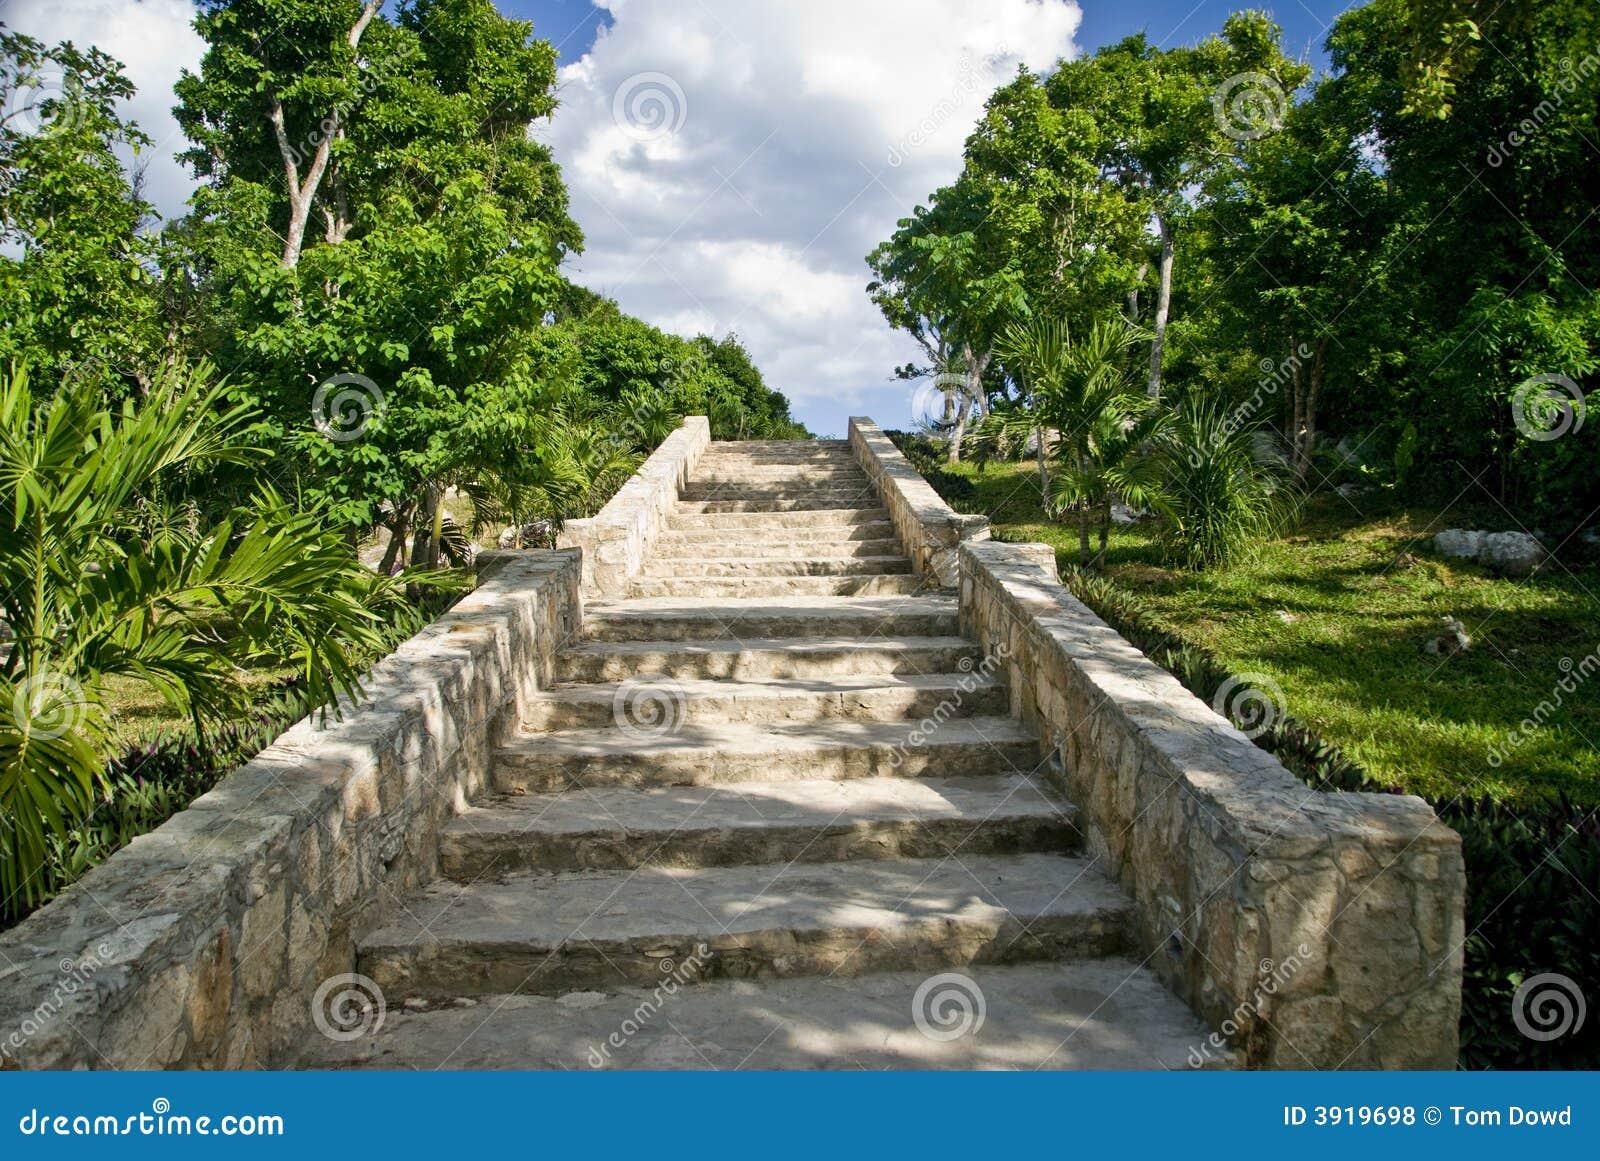 escalier en pierre aux ruines maya photos libres de droits. Black Bedroom Furniture Sets. Home Design Ideas